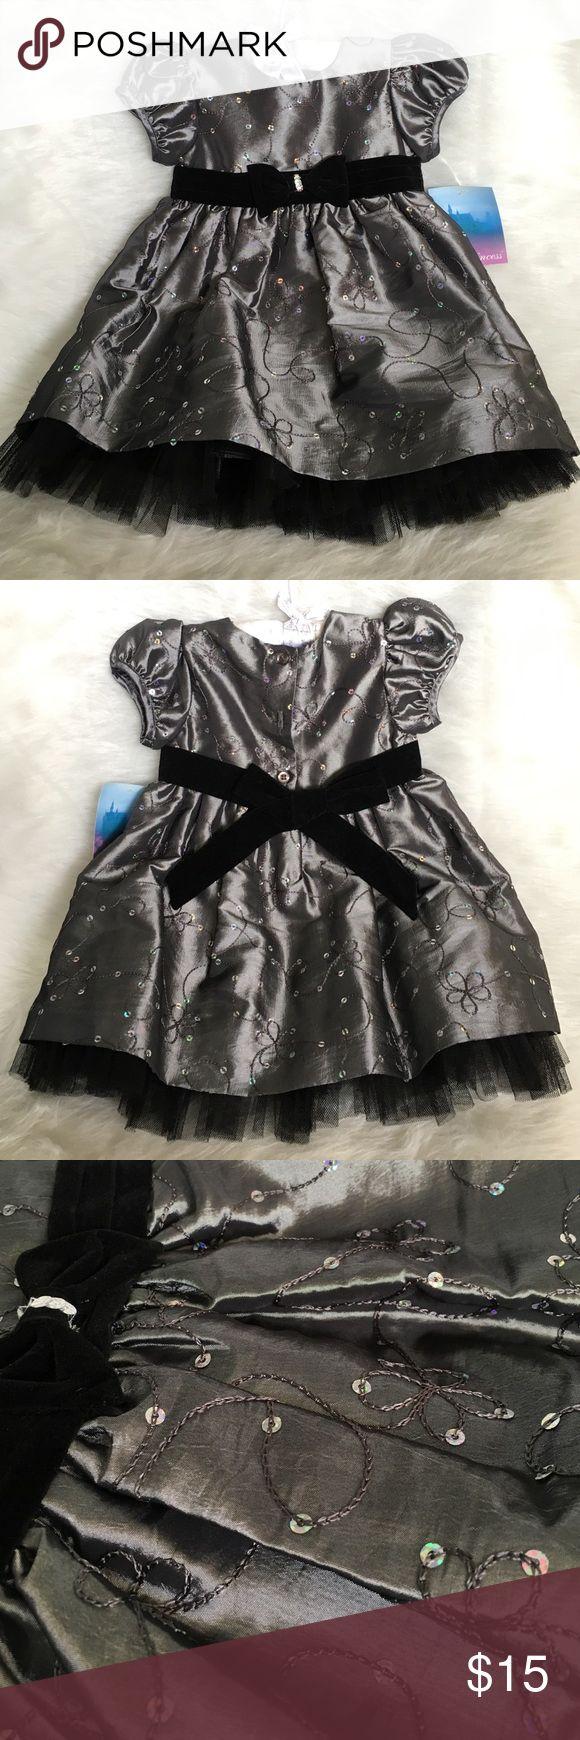 Special Occasion Dress - Grey/Silver Brand new - Special Occasion Dress - Grey/Silver with  iridescent sparkles La Princess Dresses Formal